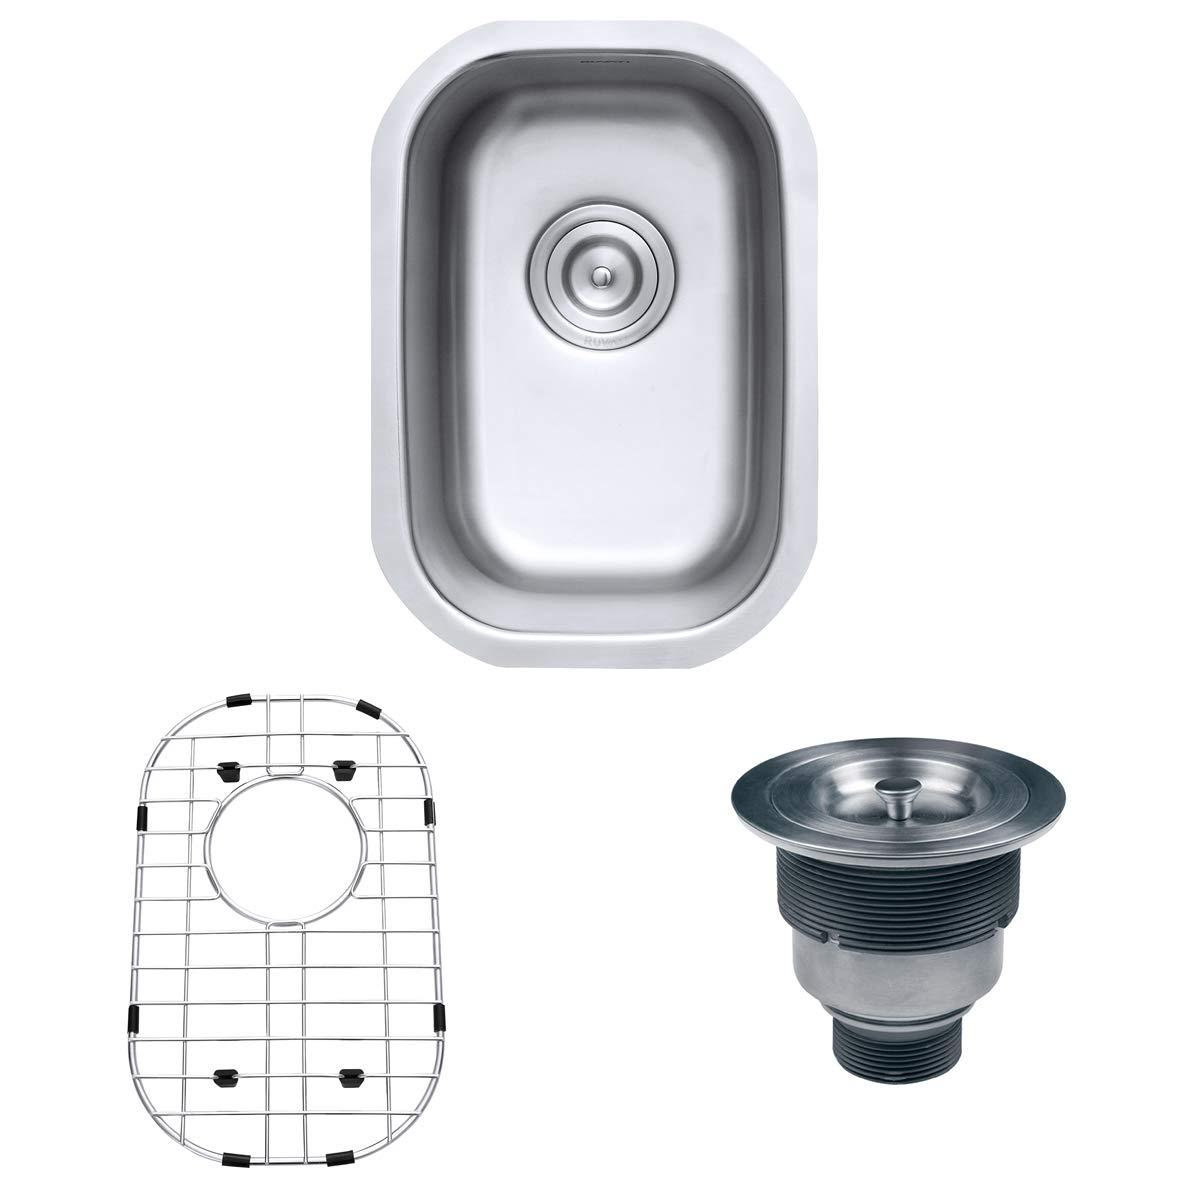 1. Ruvati RVM4111 Undermount Bar Prep Sink